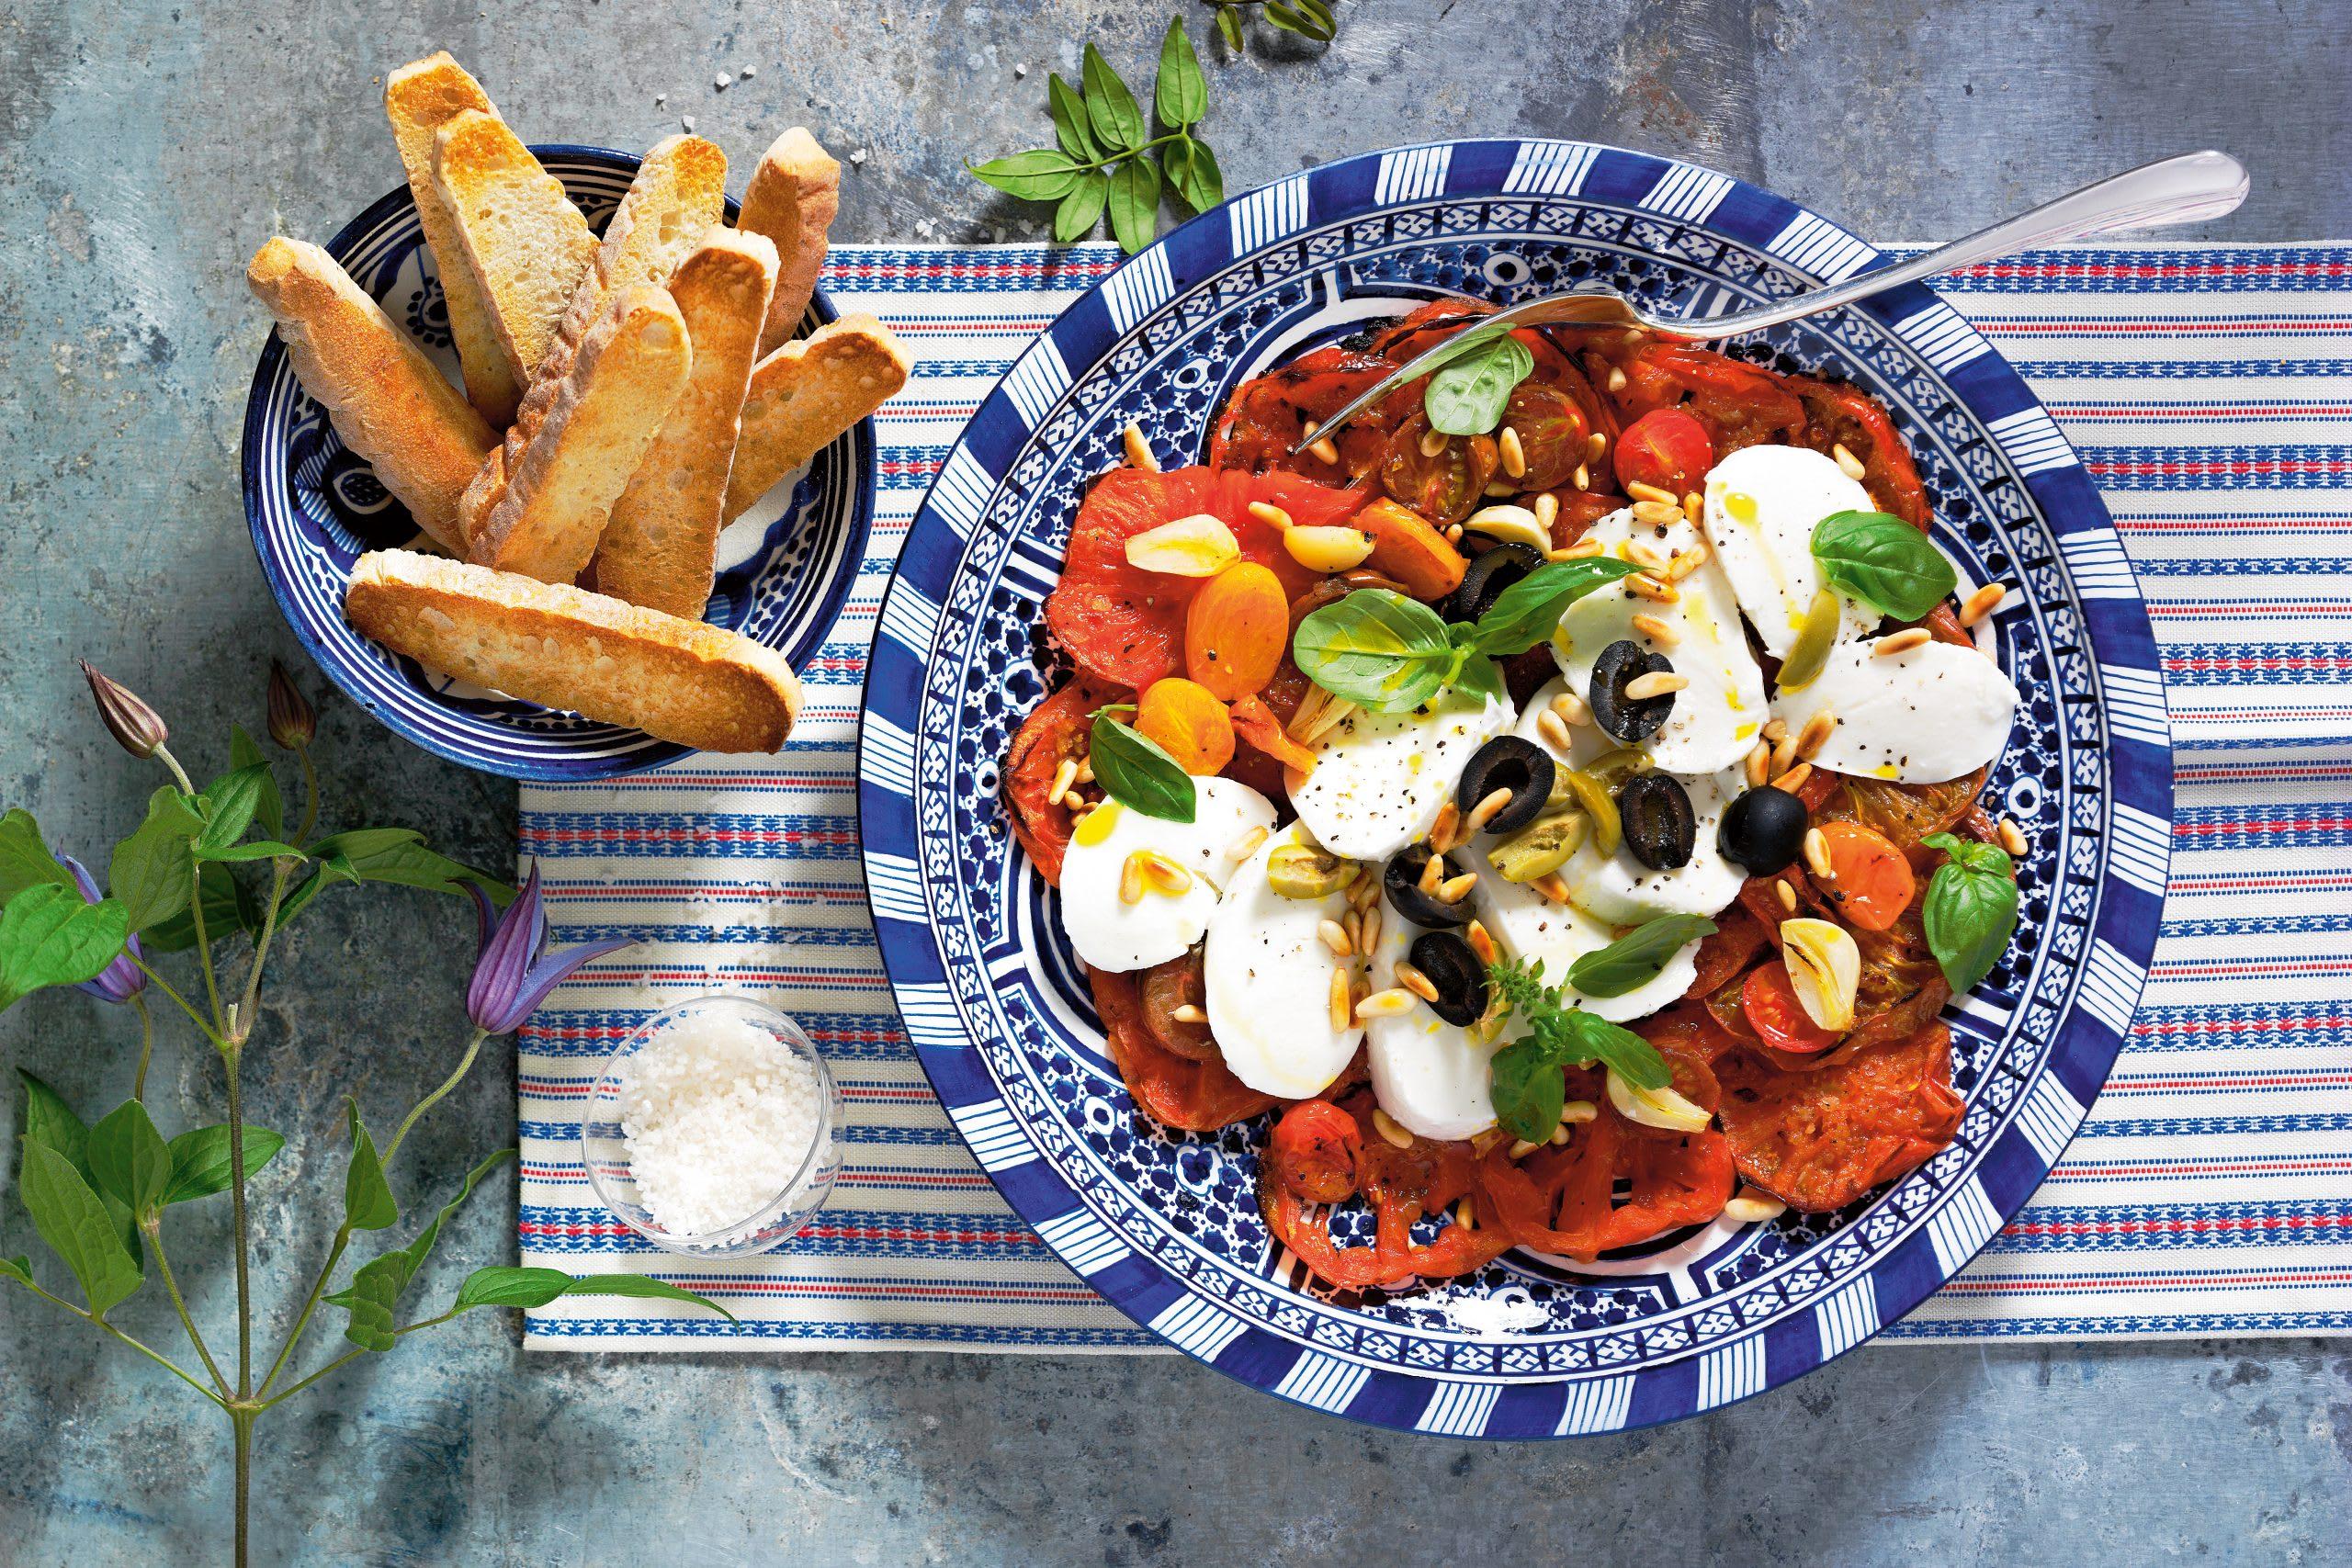 Salade tomate-mozzarella améliorée